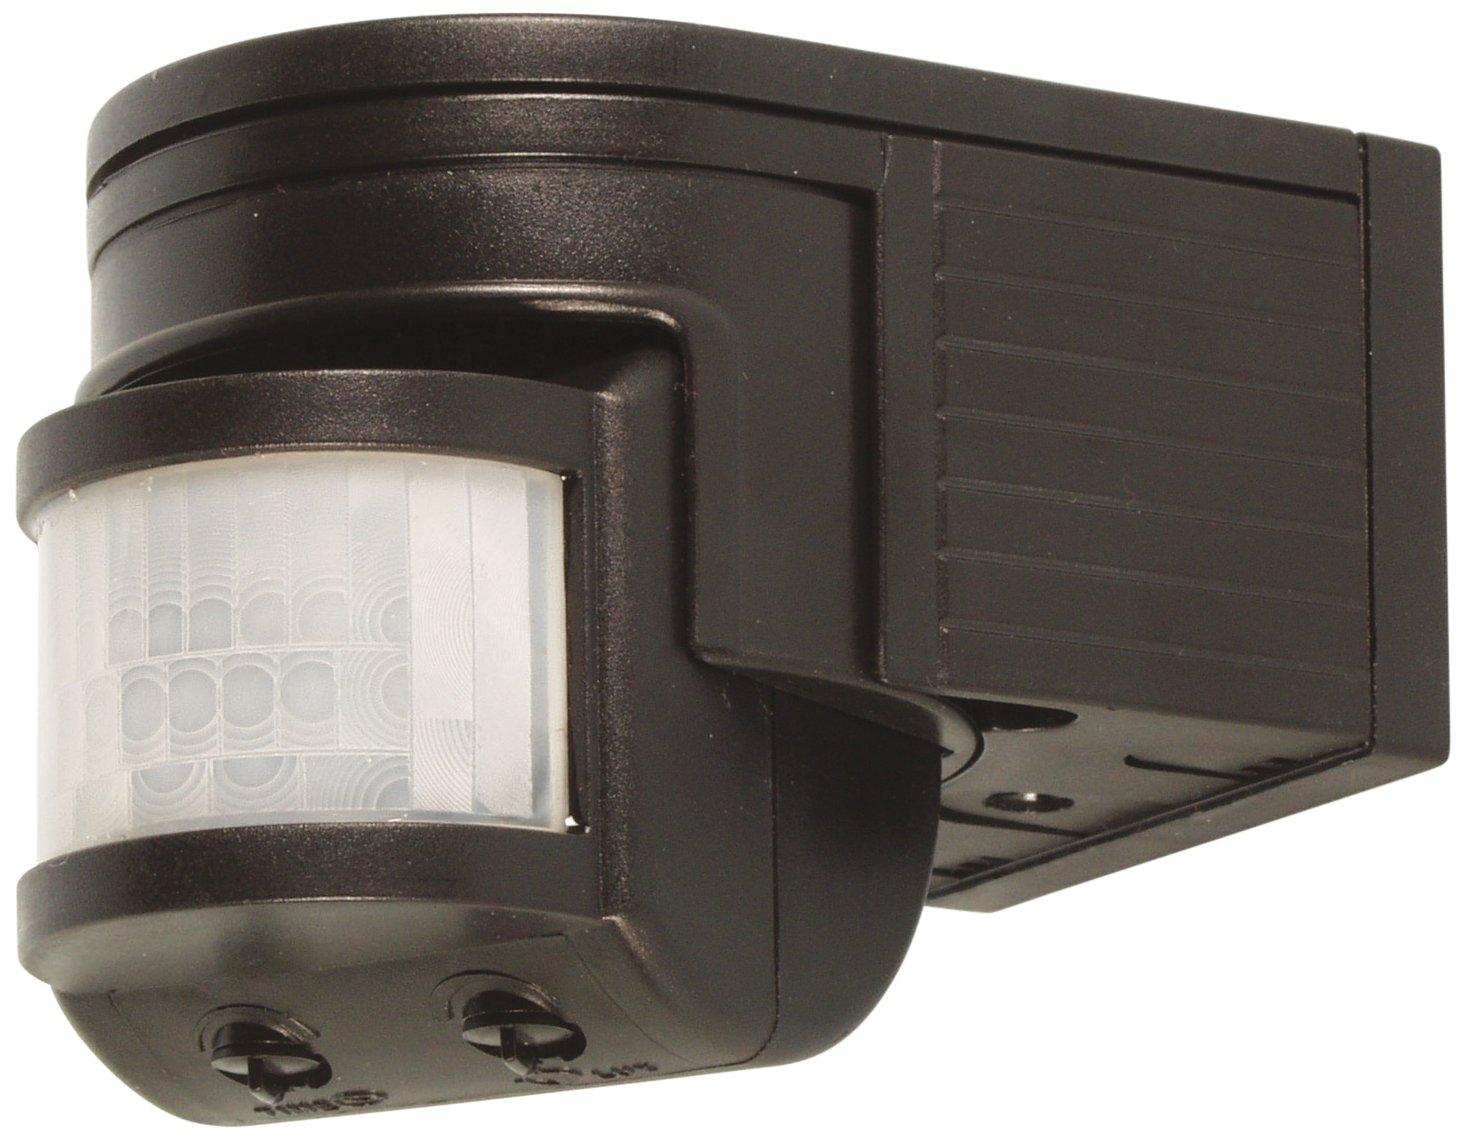 Velleman PIR1200B 180 Degree PIR Motion Detector, Multi-Colour